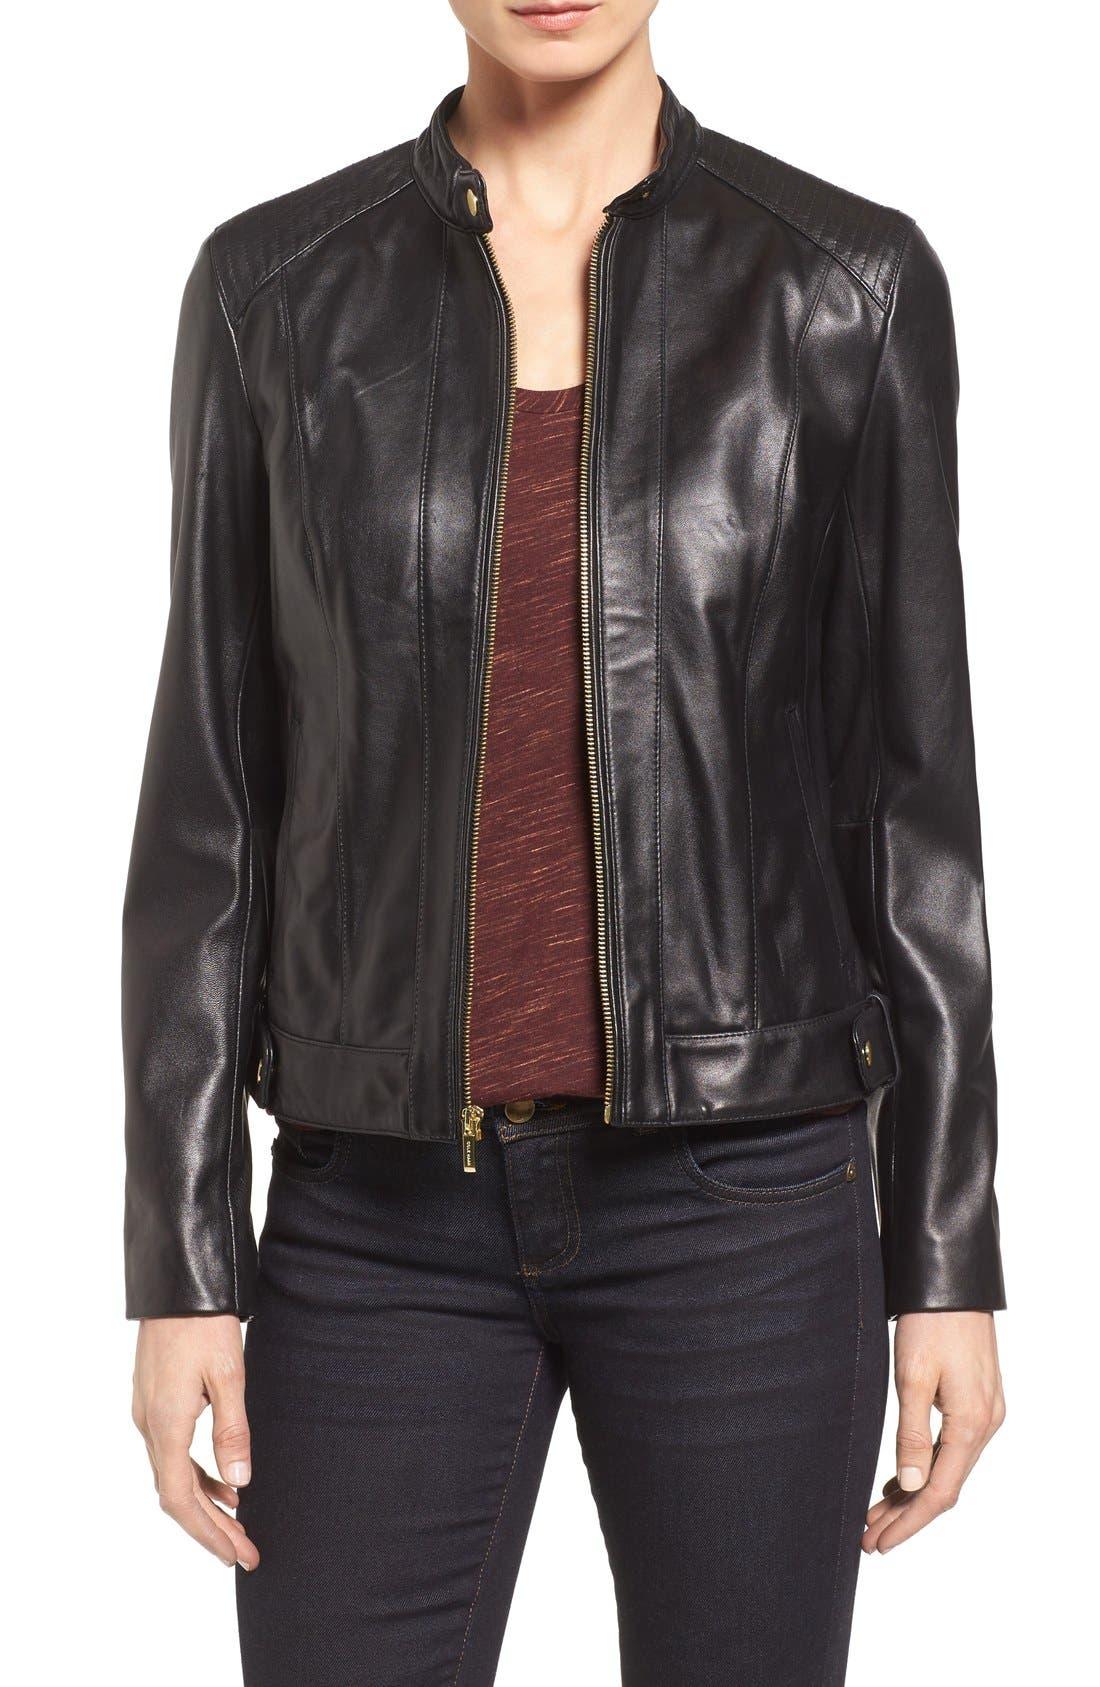 Petite Women's Cole Haan Leather Moto Jacket